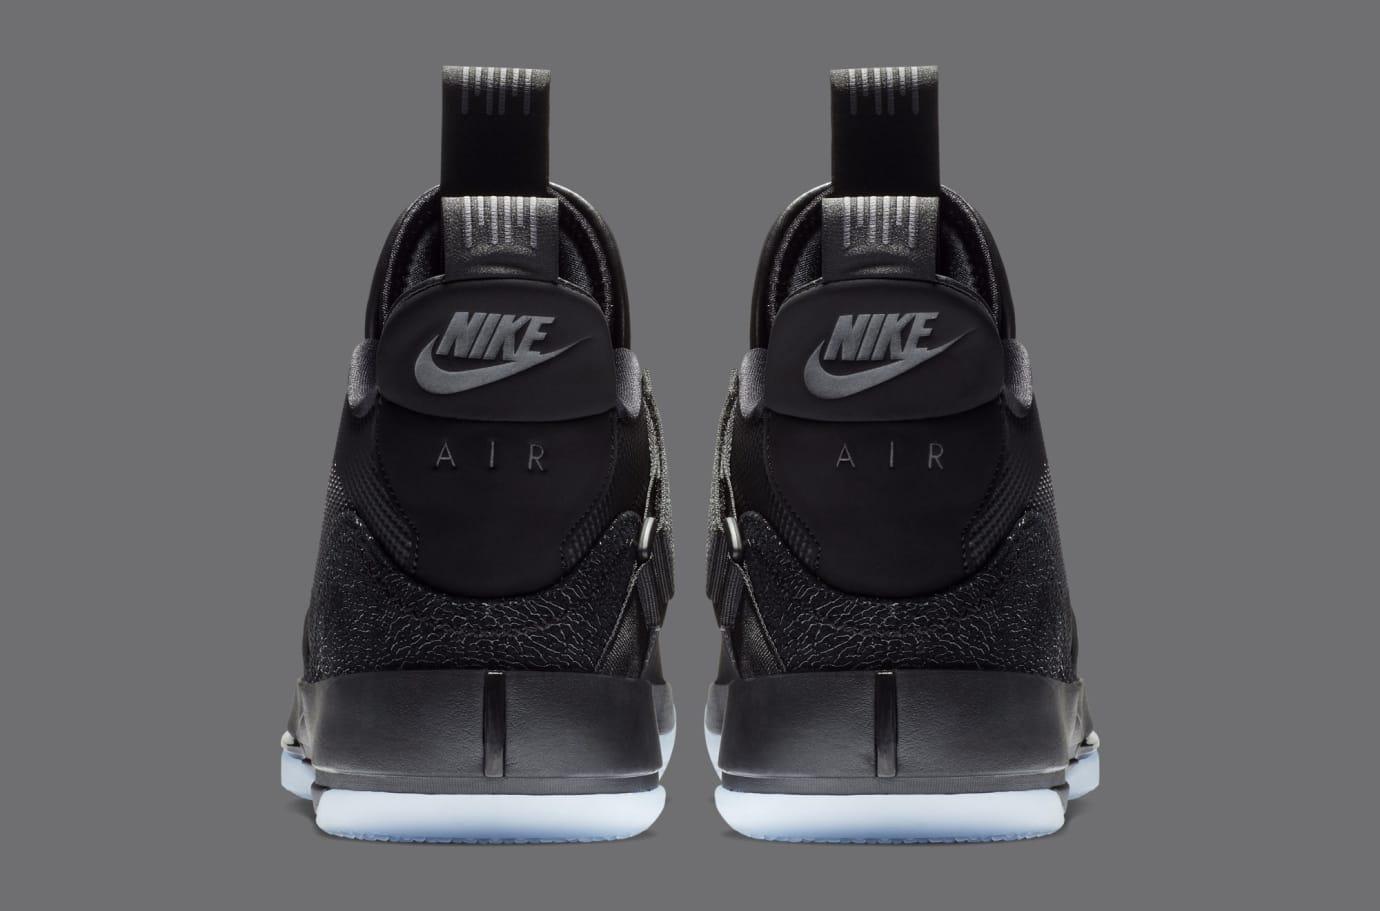 Air Jordan 33 'Utility Blackout' AQ8830-002 (Heel)